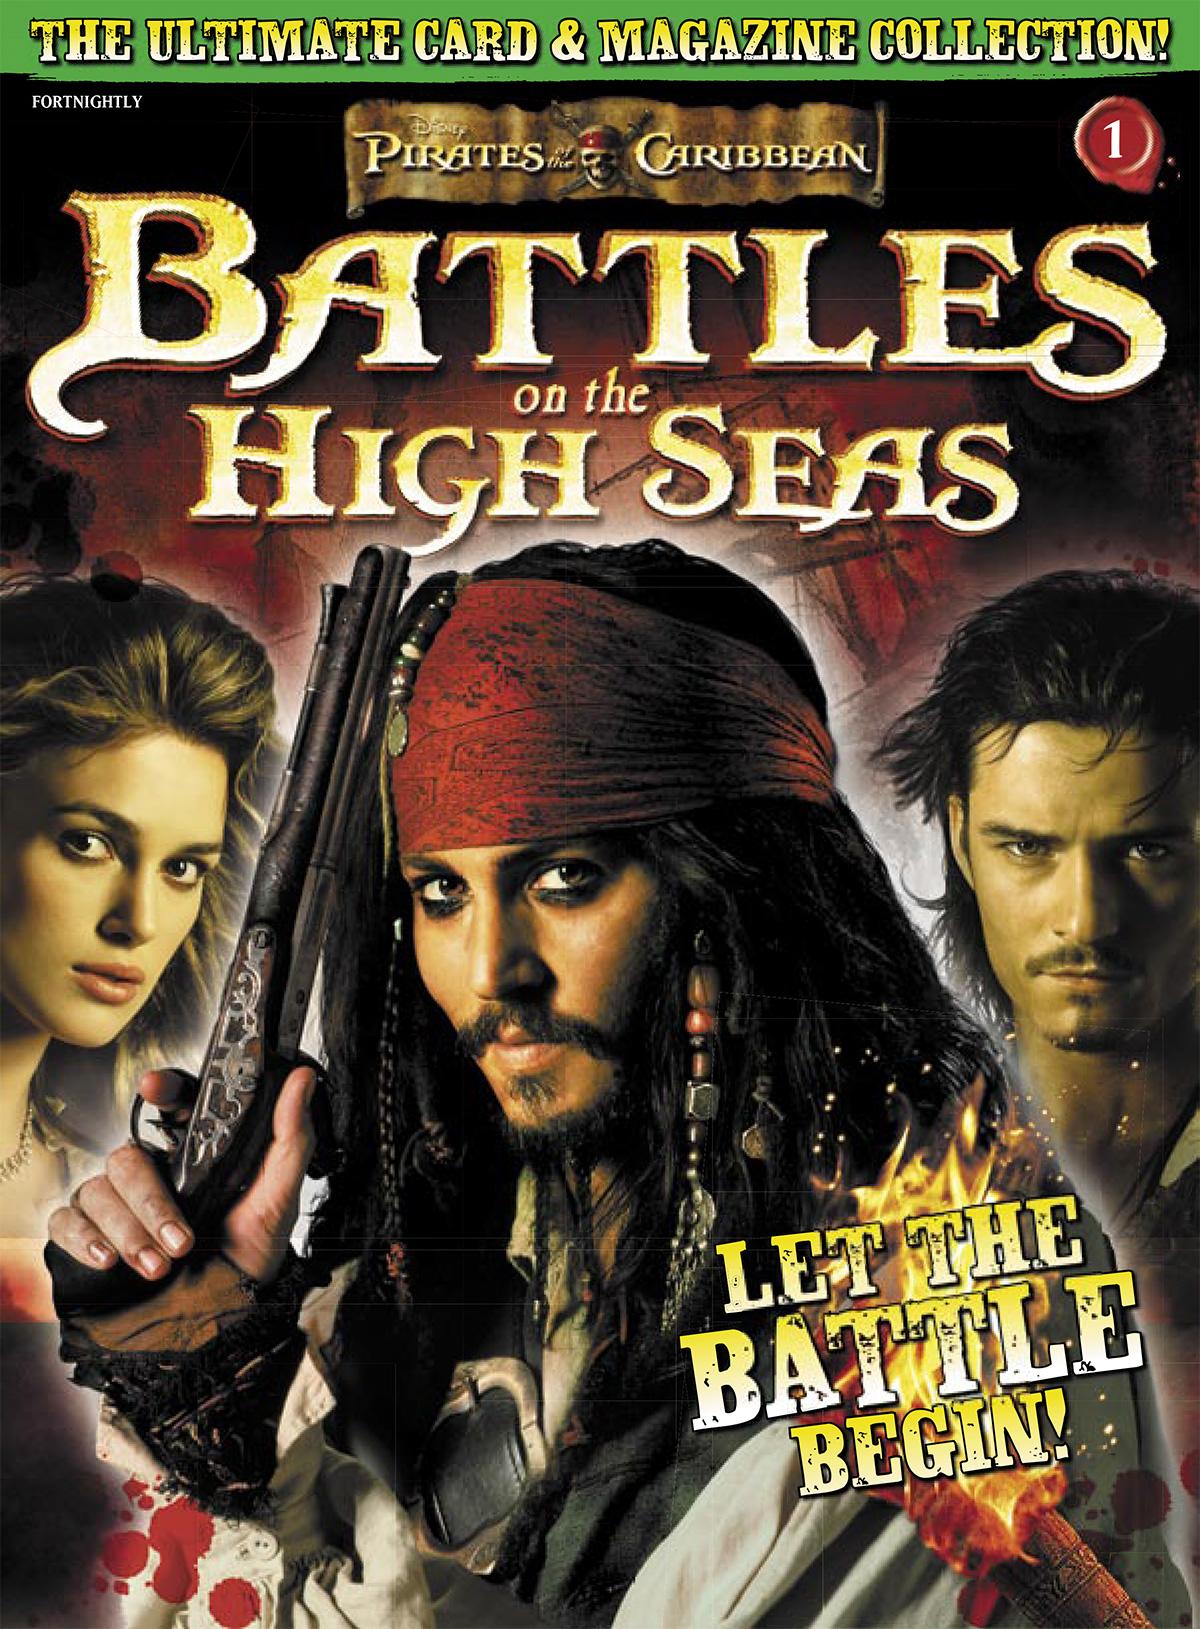 Battles on the High Seas children's magazines